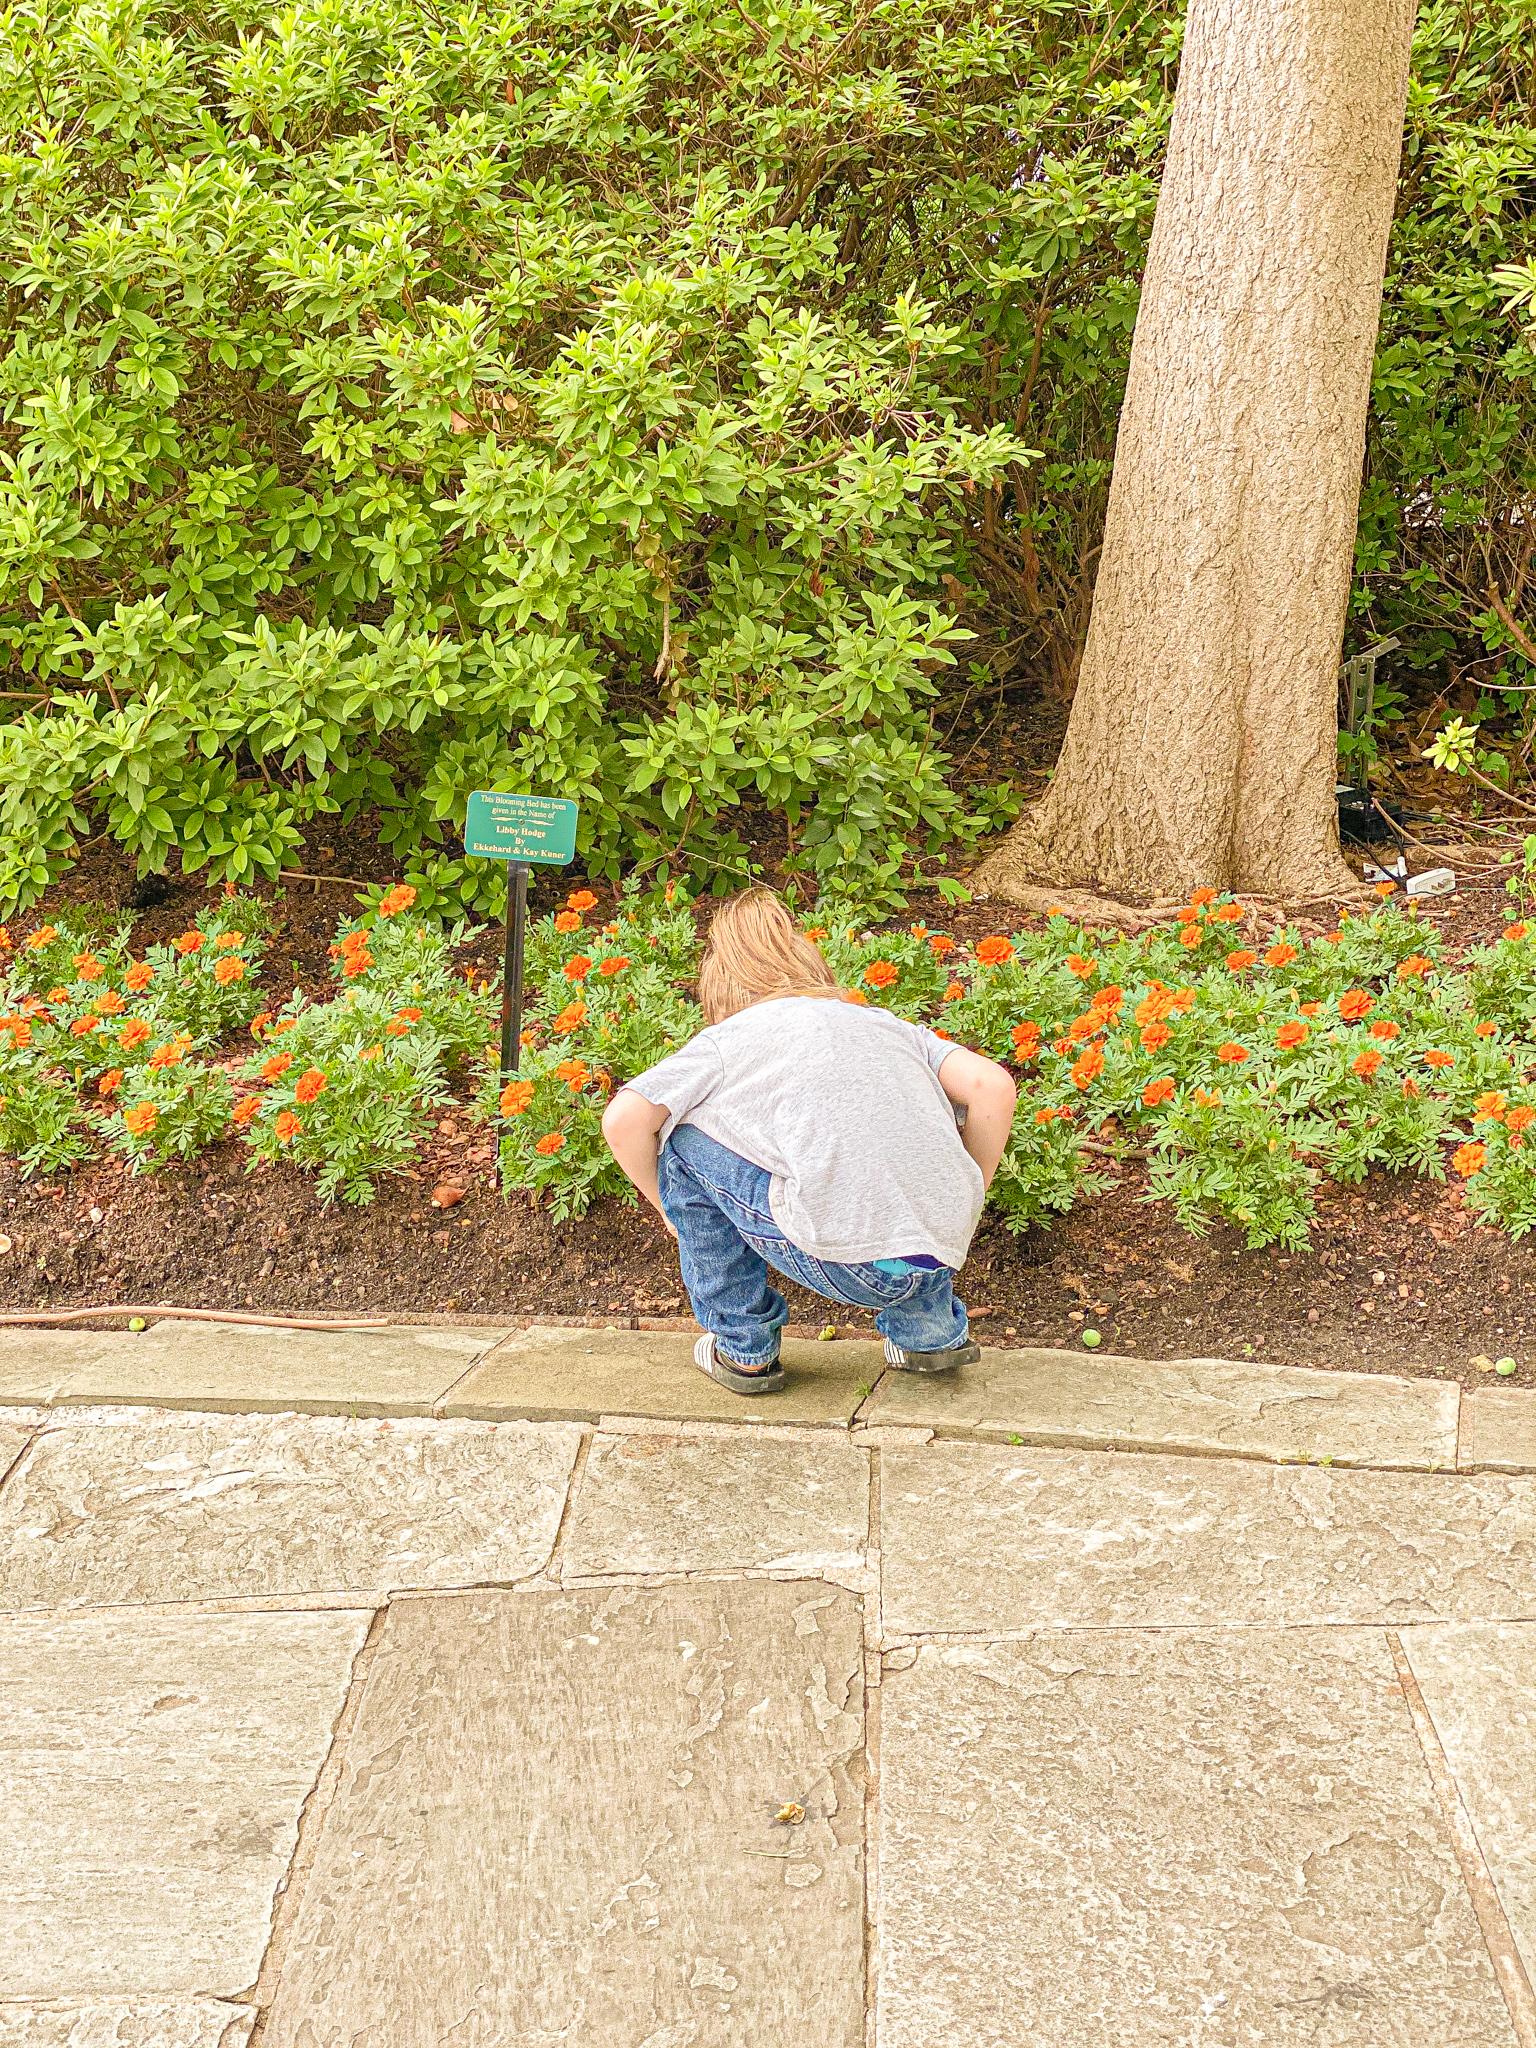 Dallas Arboretum Garden Walk